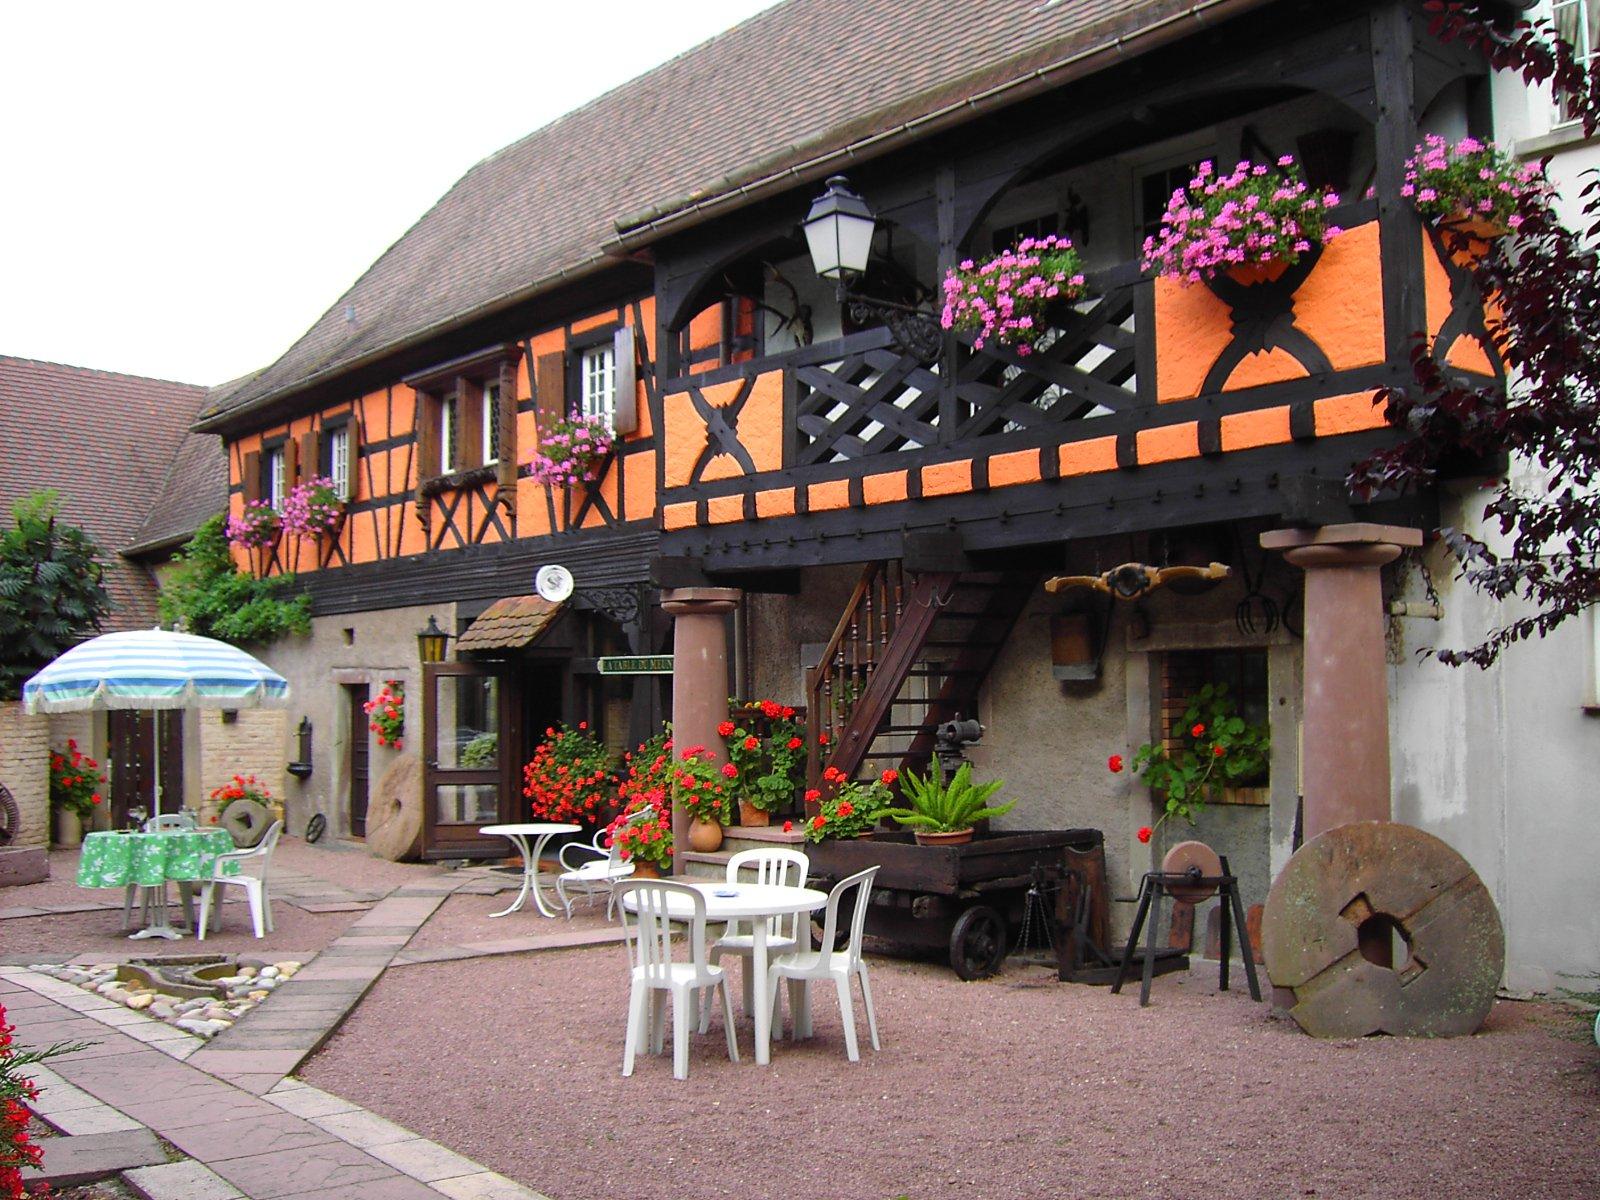 Office de tourisme eguisheim environs h tels - Office de tourisme eguisheim ...